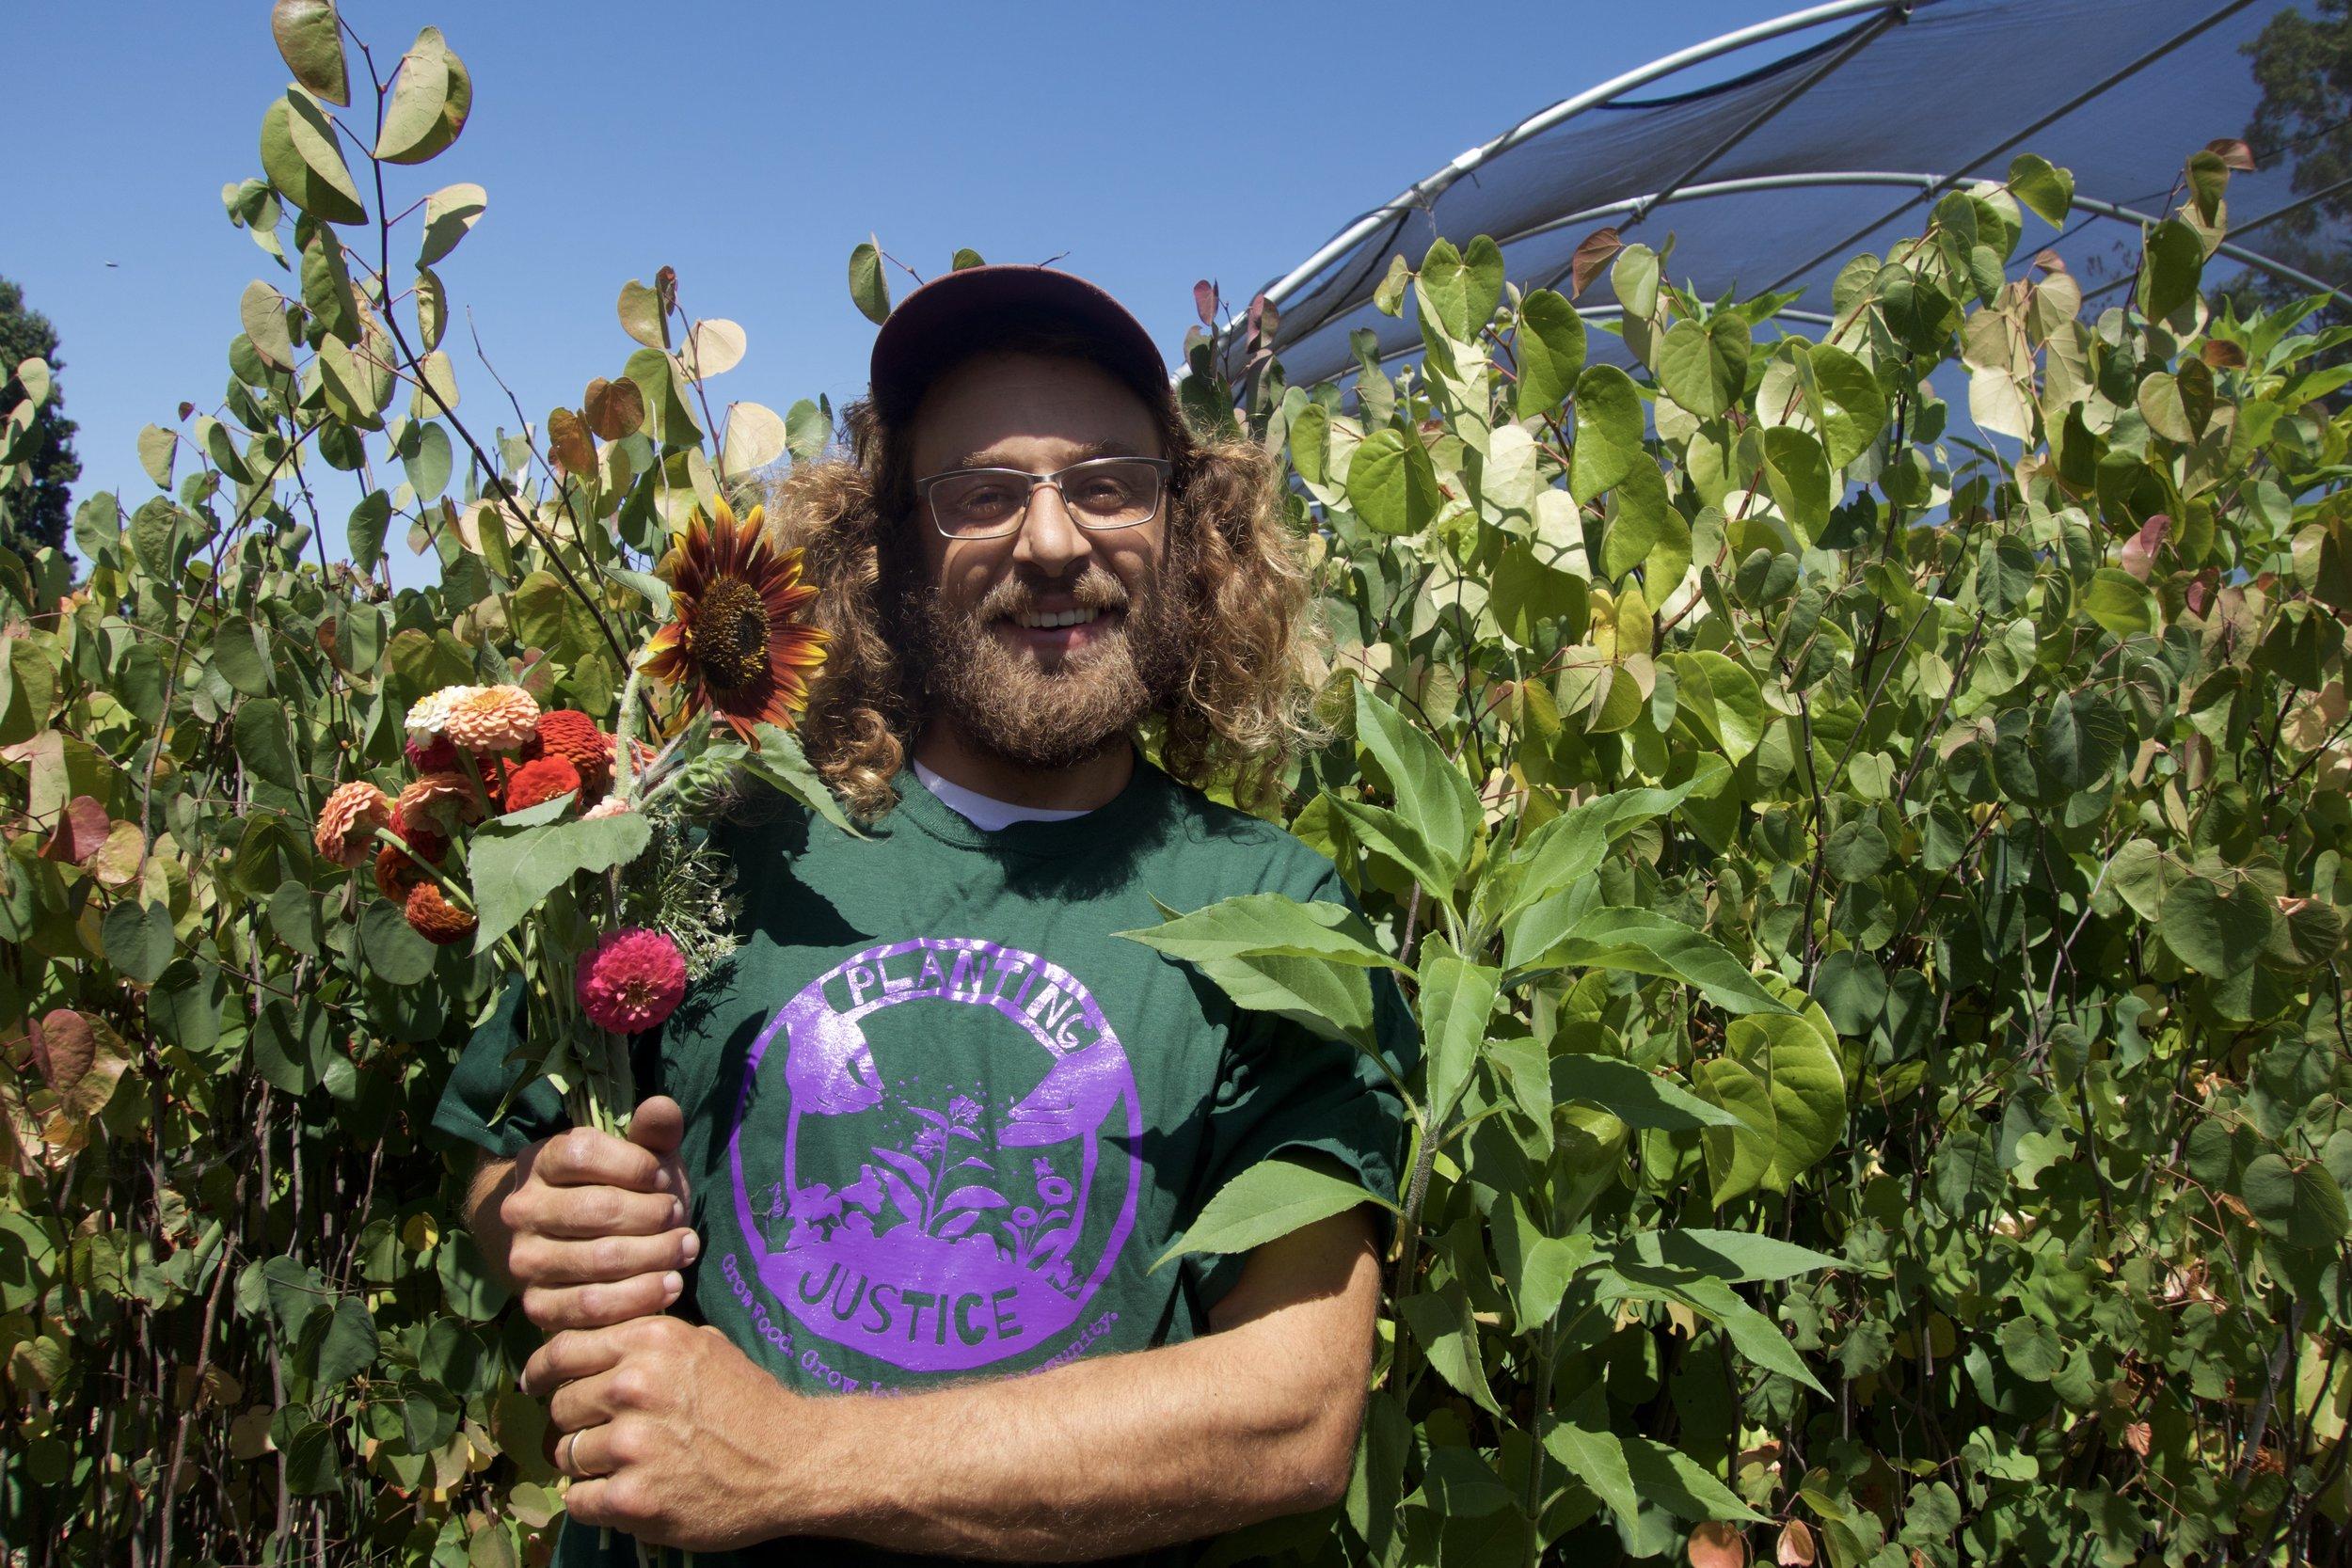 Planting Justice Farm Team, Andrew